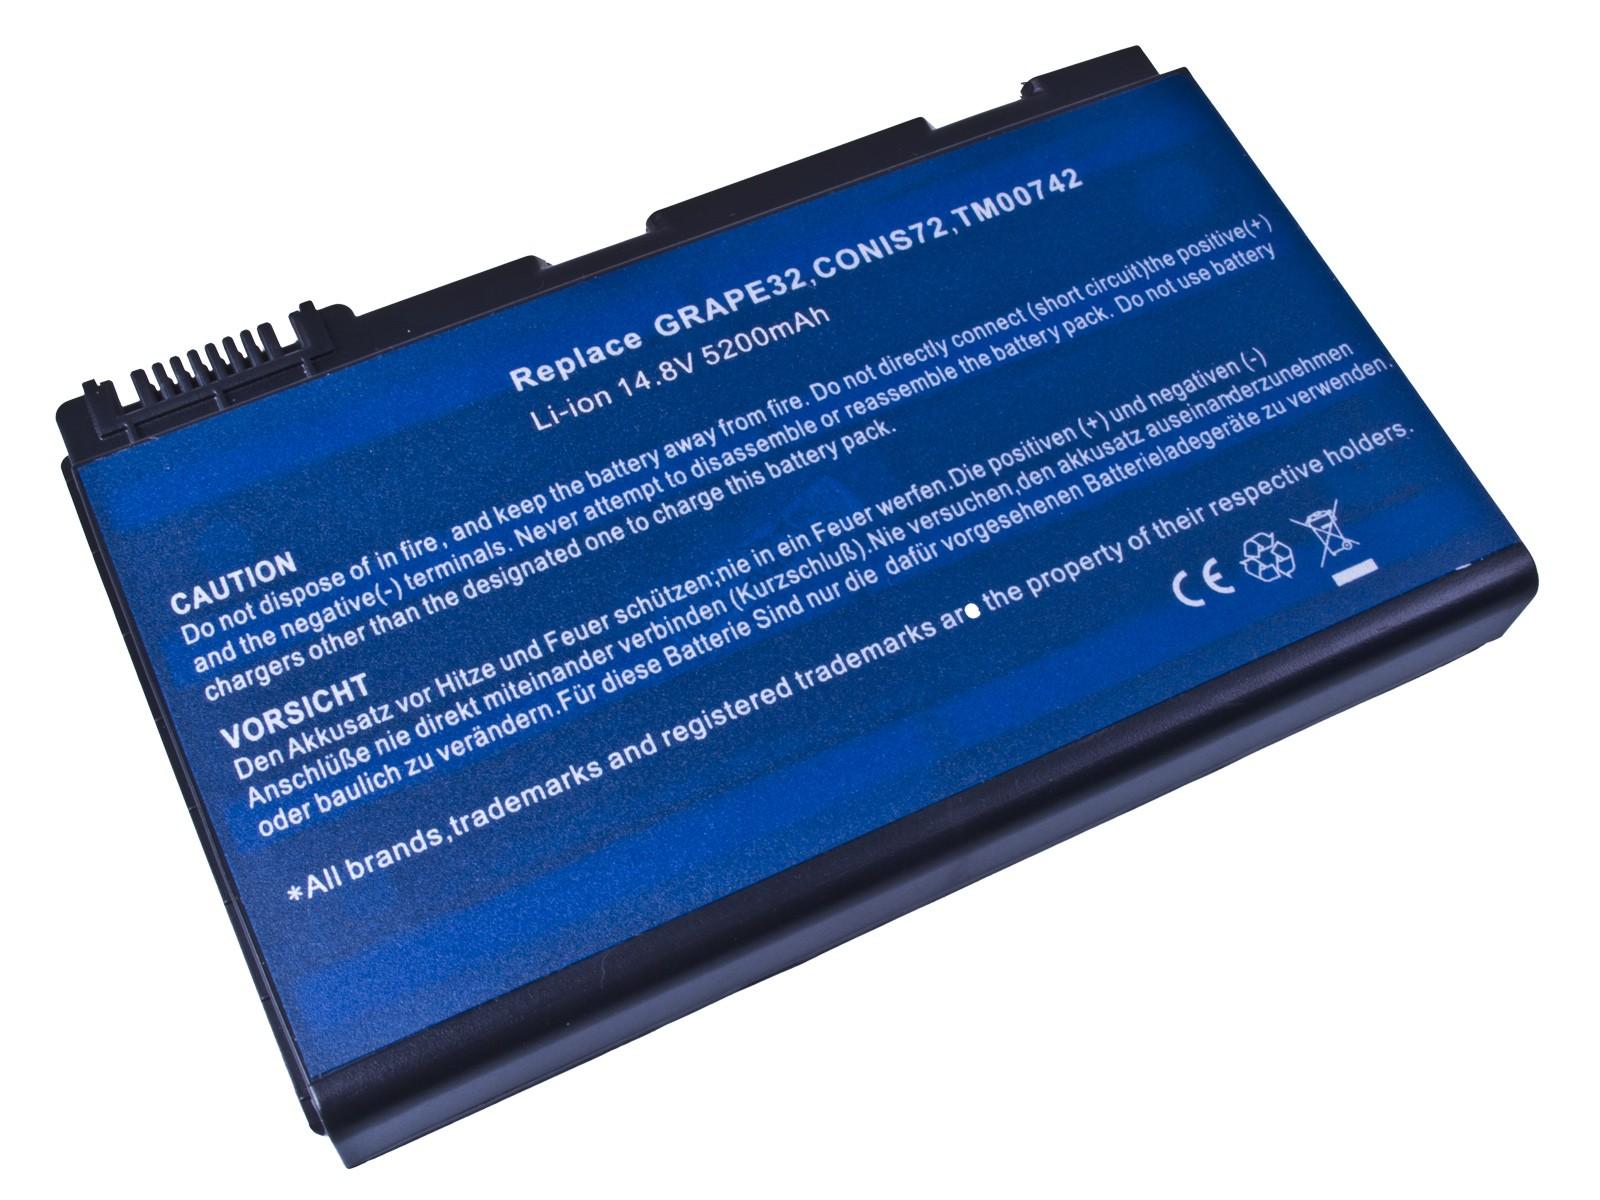 Baterie AVACOM NOAC-TM53-806 pro Acer TravelMate 5310/5720, Extensa 5220/5620 Li-Ion 14,8V 5200mAh